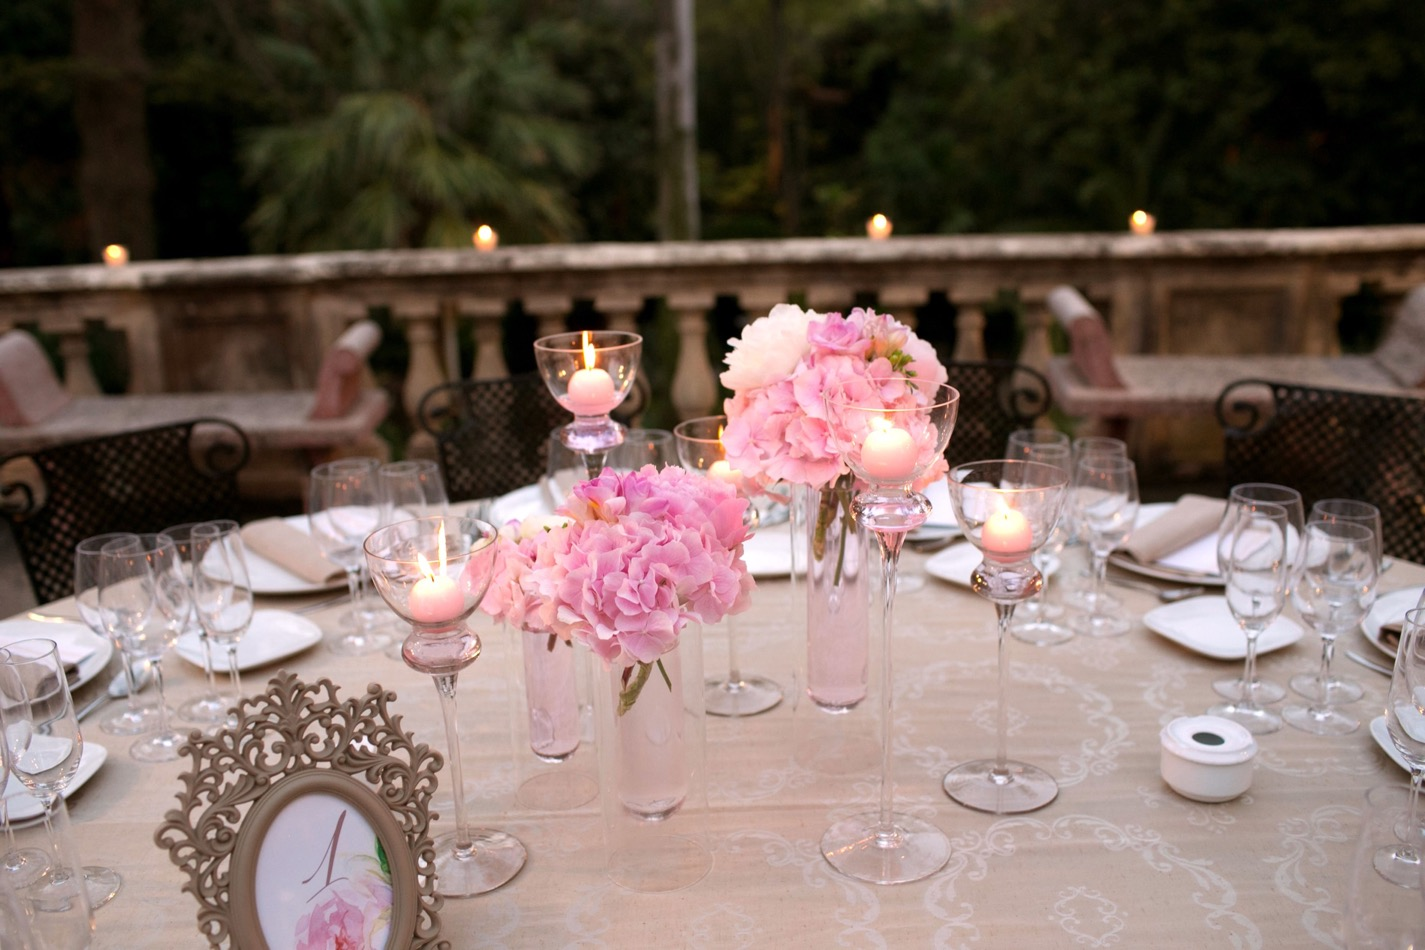 Si-Quiero-Wedding-Planner-By-Sira-Antequera-Vanesa-Jose-35-1